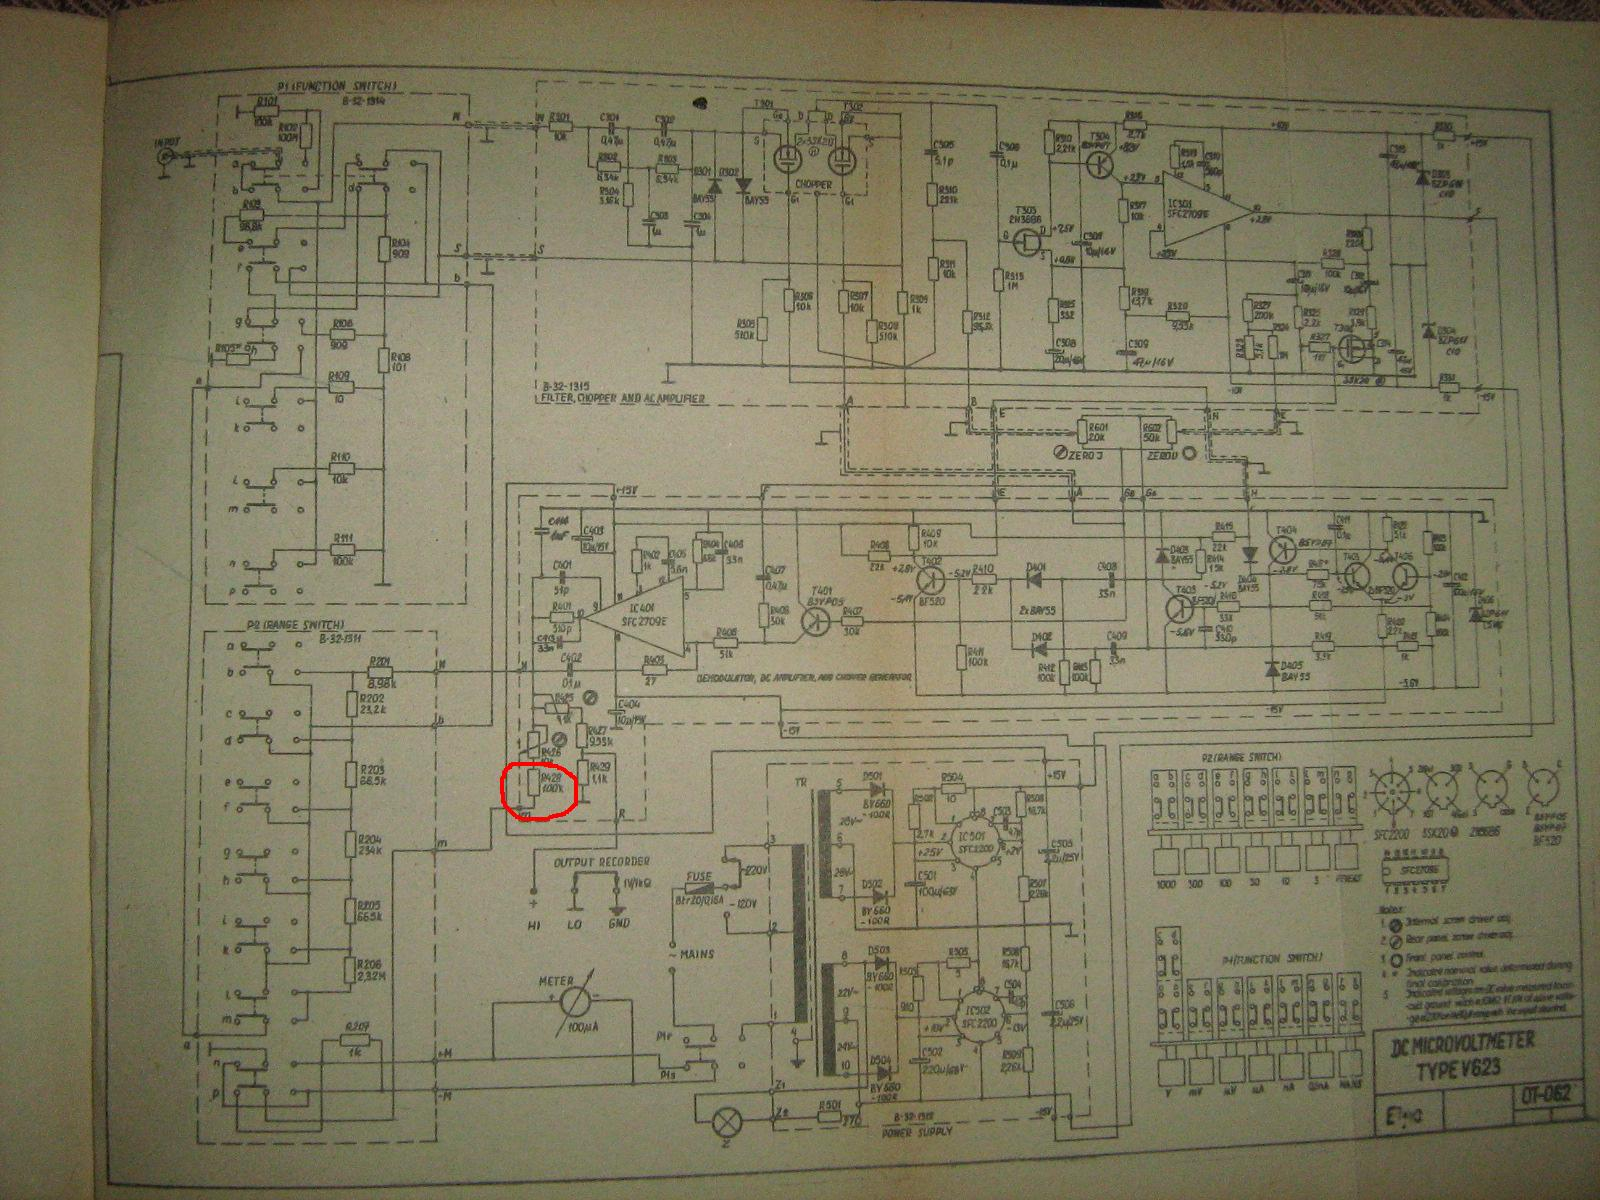 Meratronik V623 DC Microvoltmeter